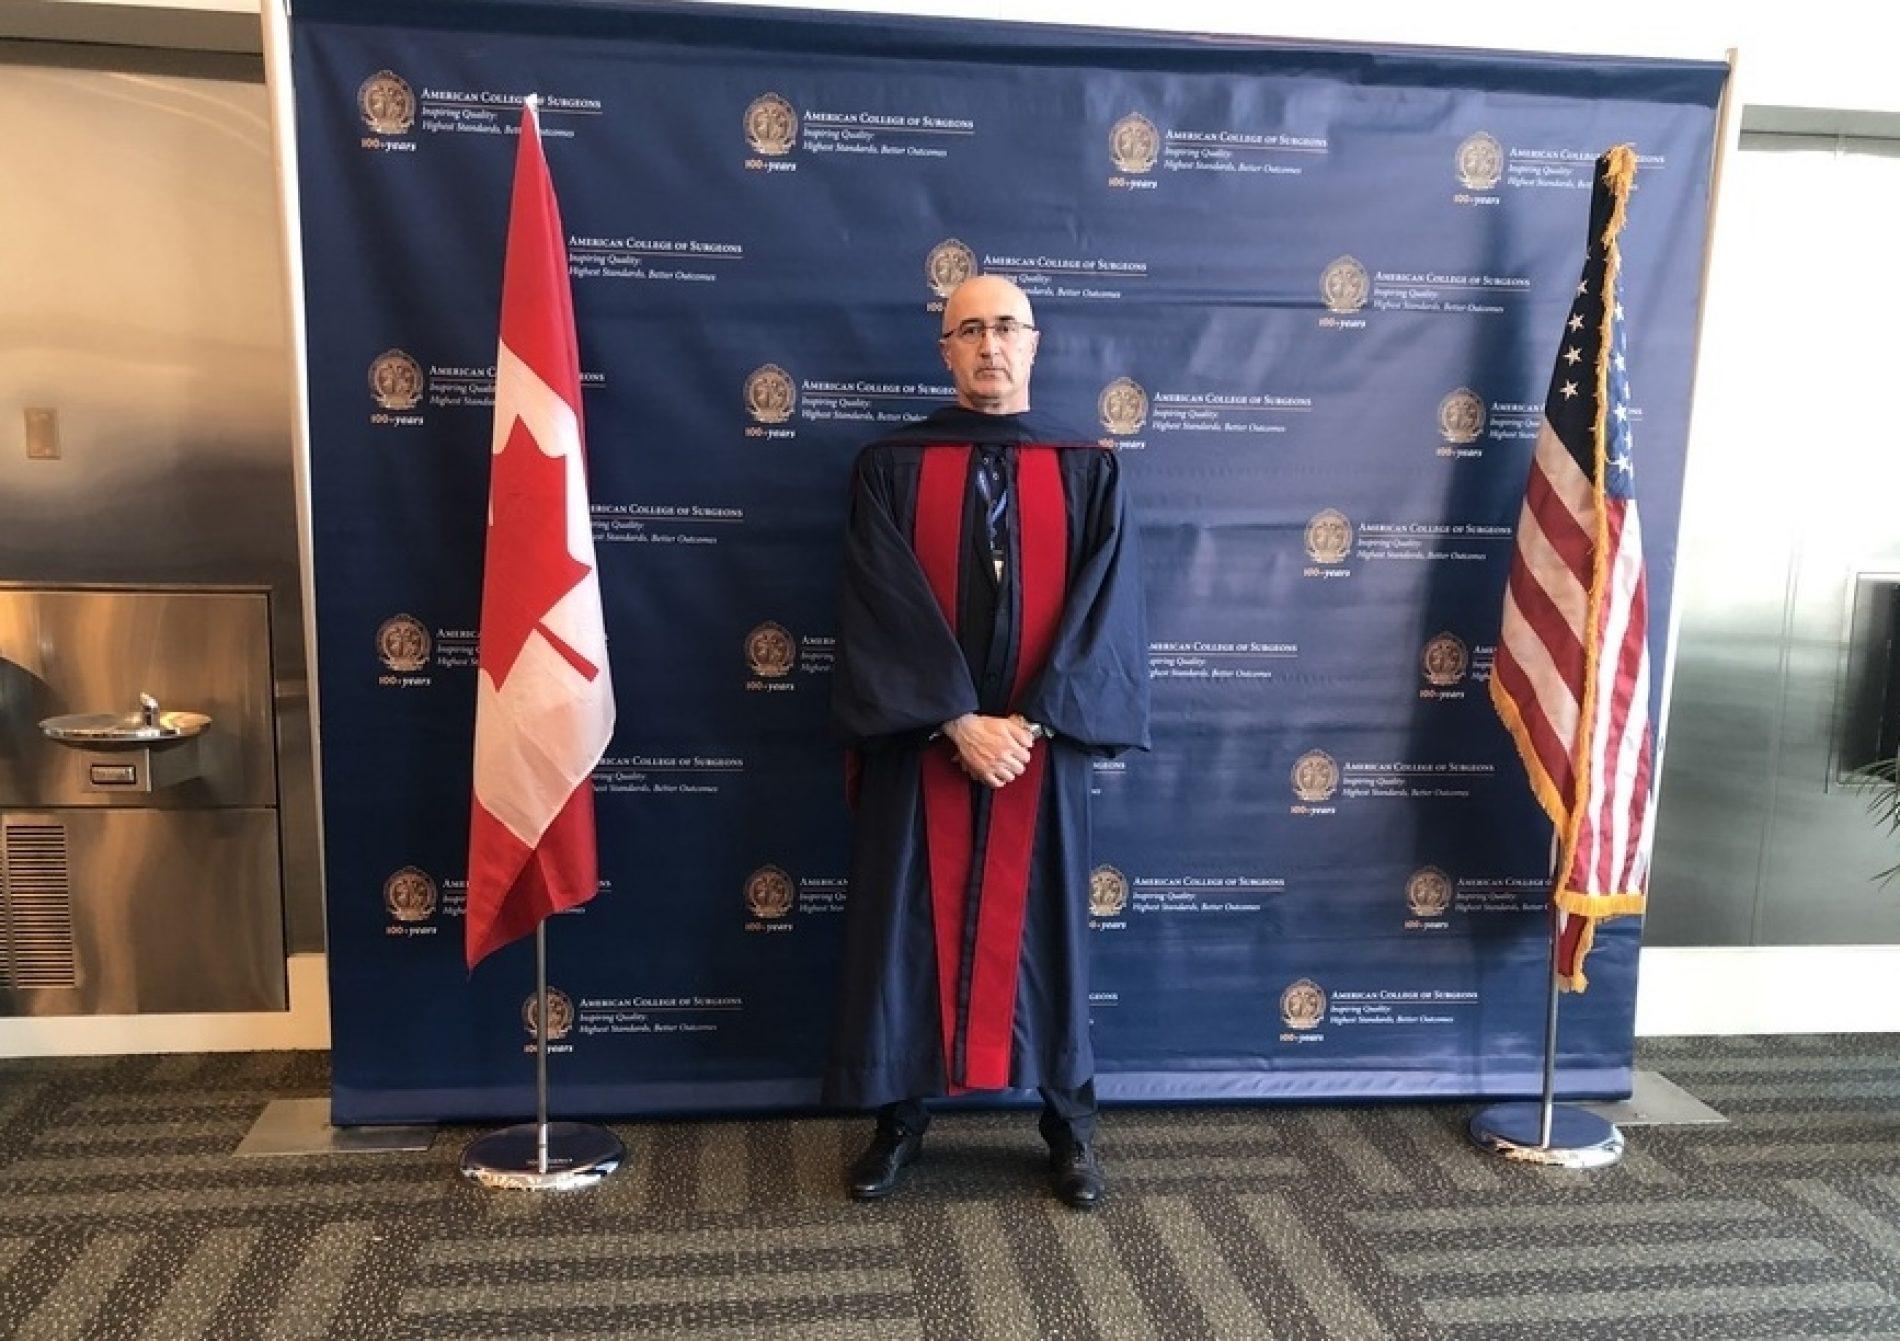 Prof. dr. Samir Delibegović postao član 'American College of Surgeons'